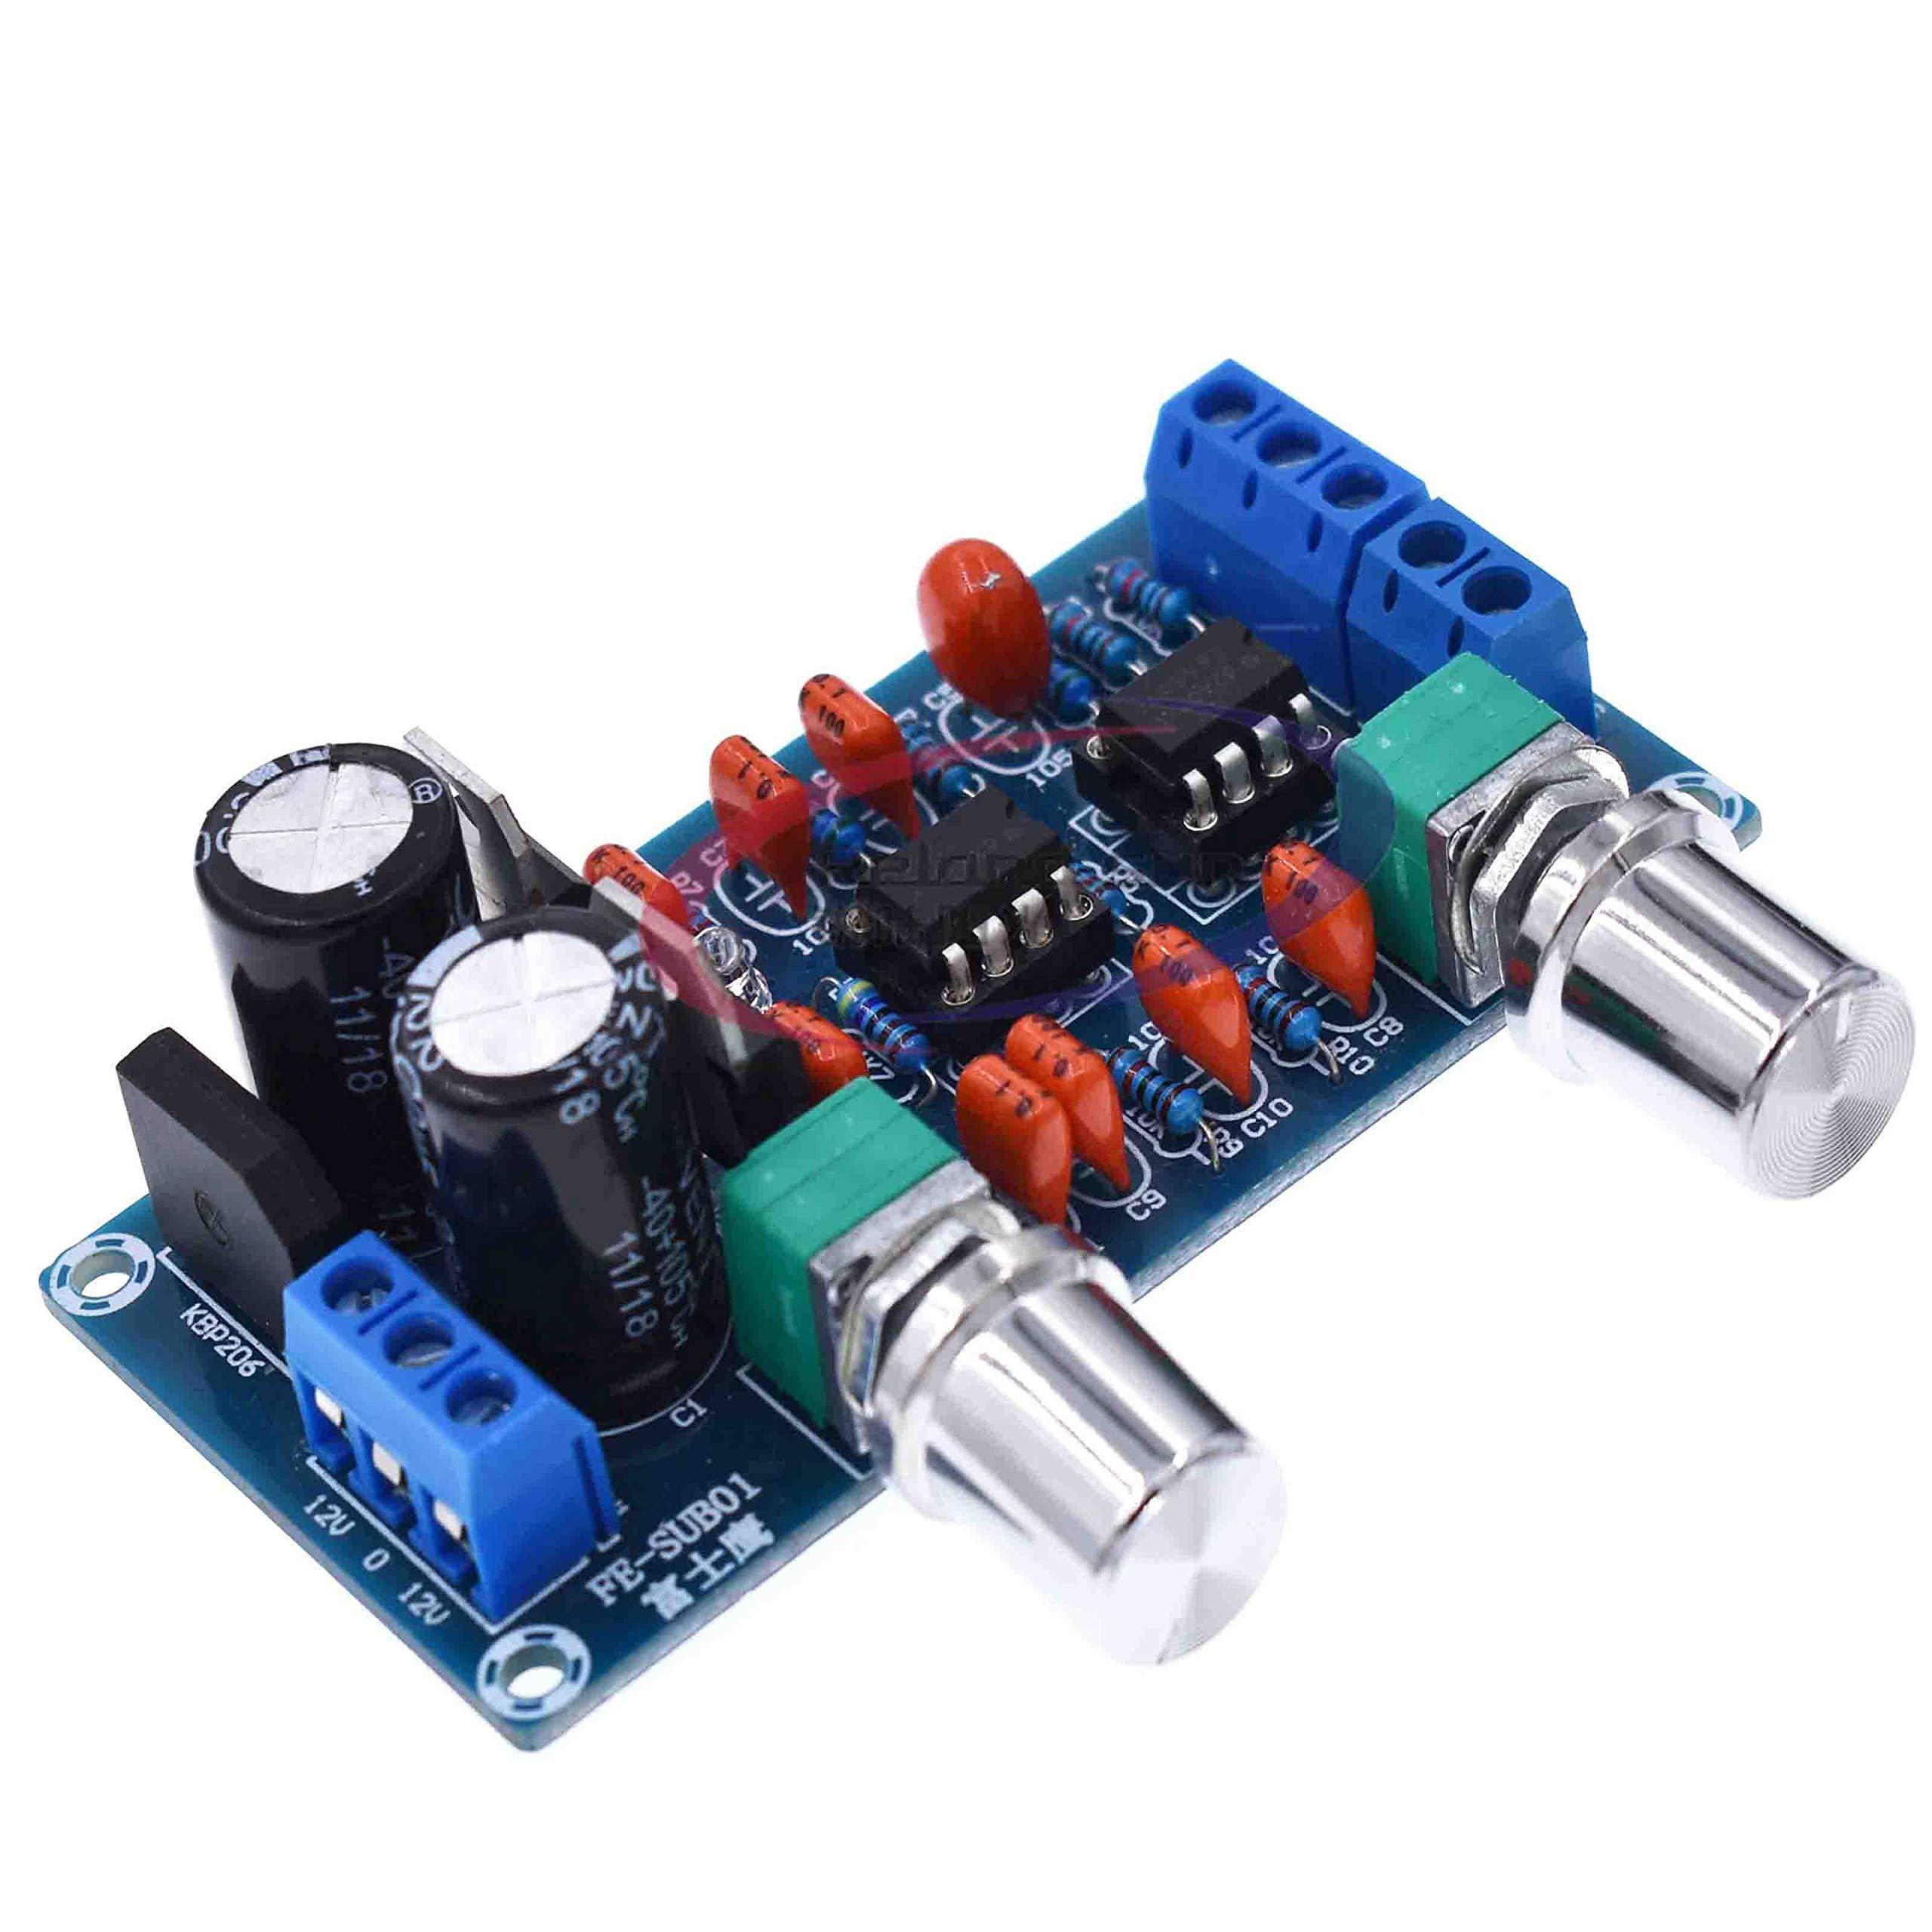 New NE5532 Low Pass Filter Board Subwoofer Volume Control Board Amplifier Module 9-15V